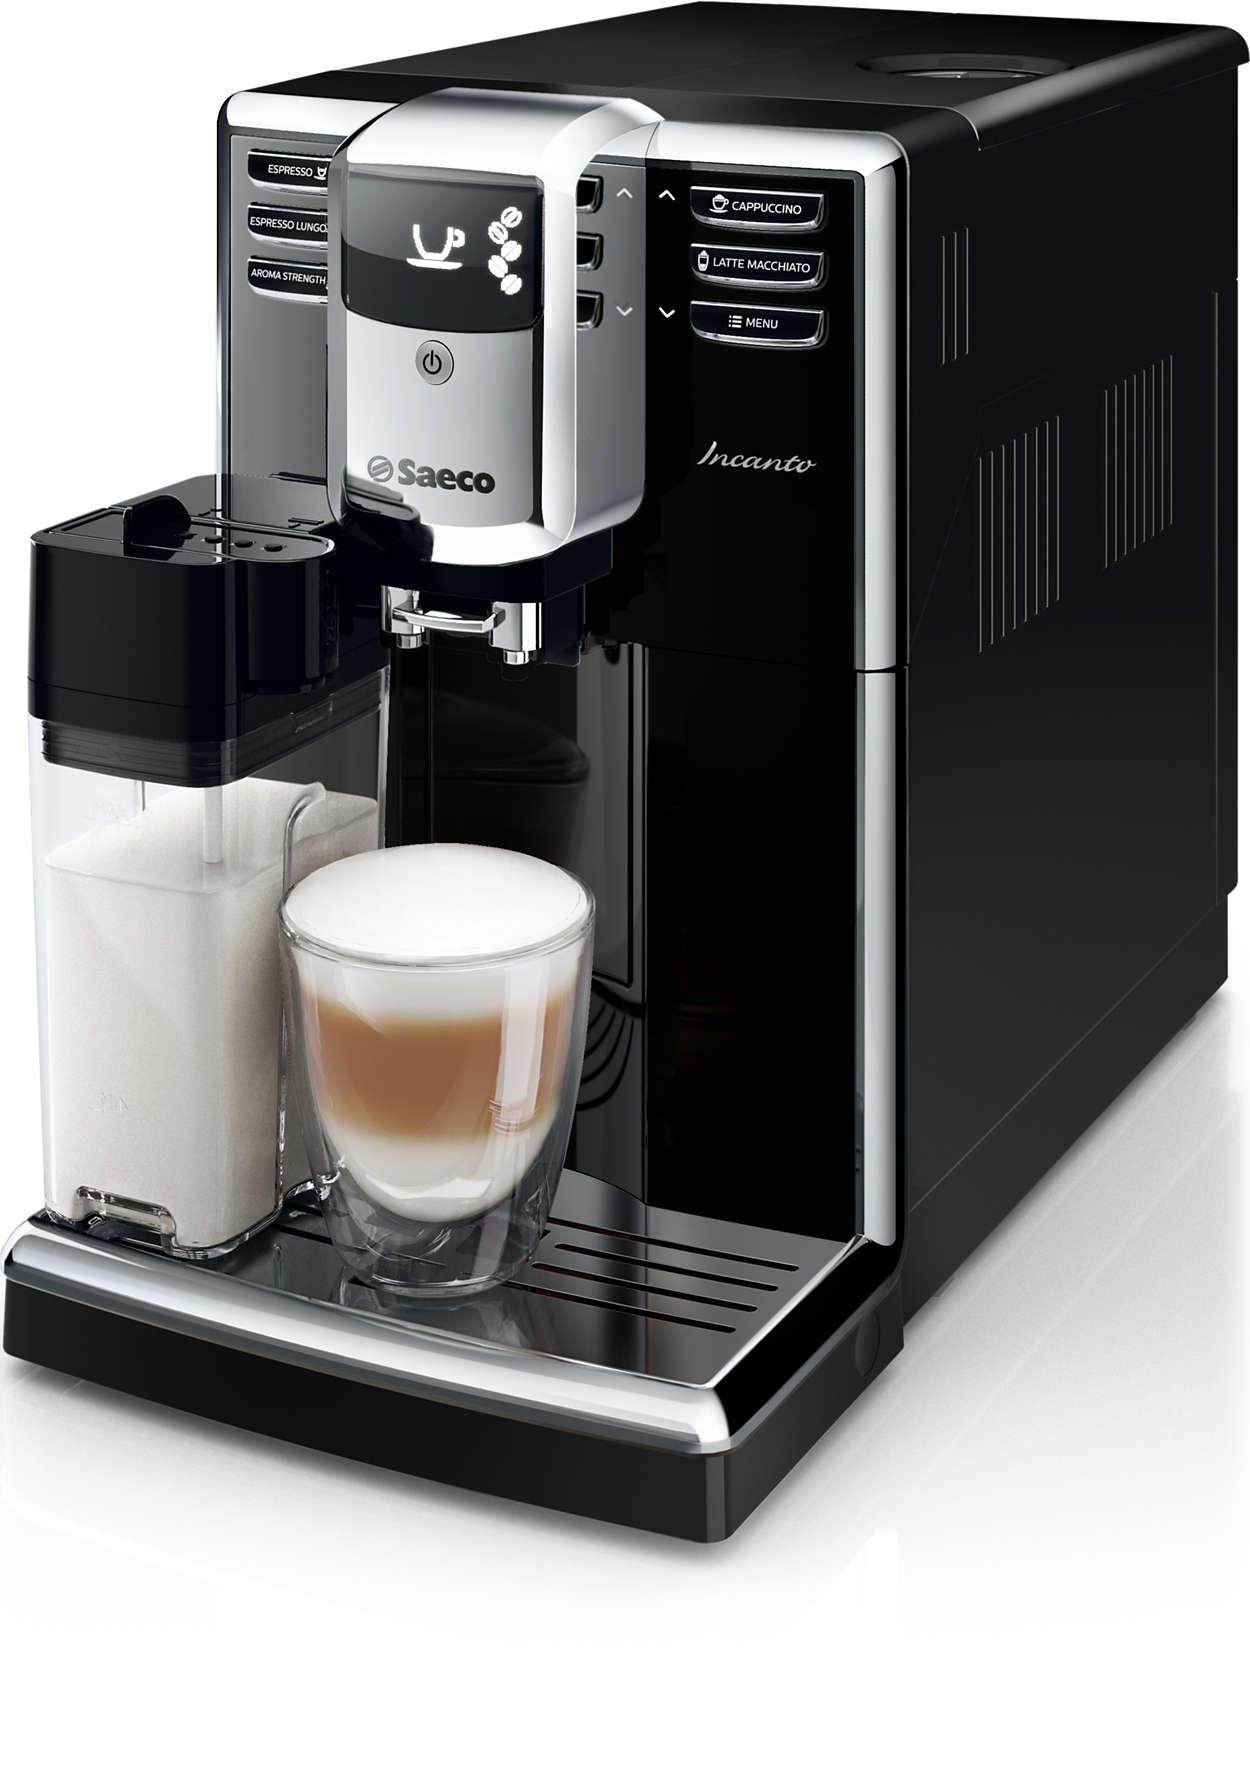 incanto machine espresso super automatique hd8916 01 saeco. Black Bedroom Furniture Sets. Home Design Ideas